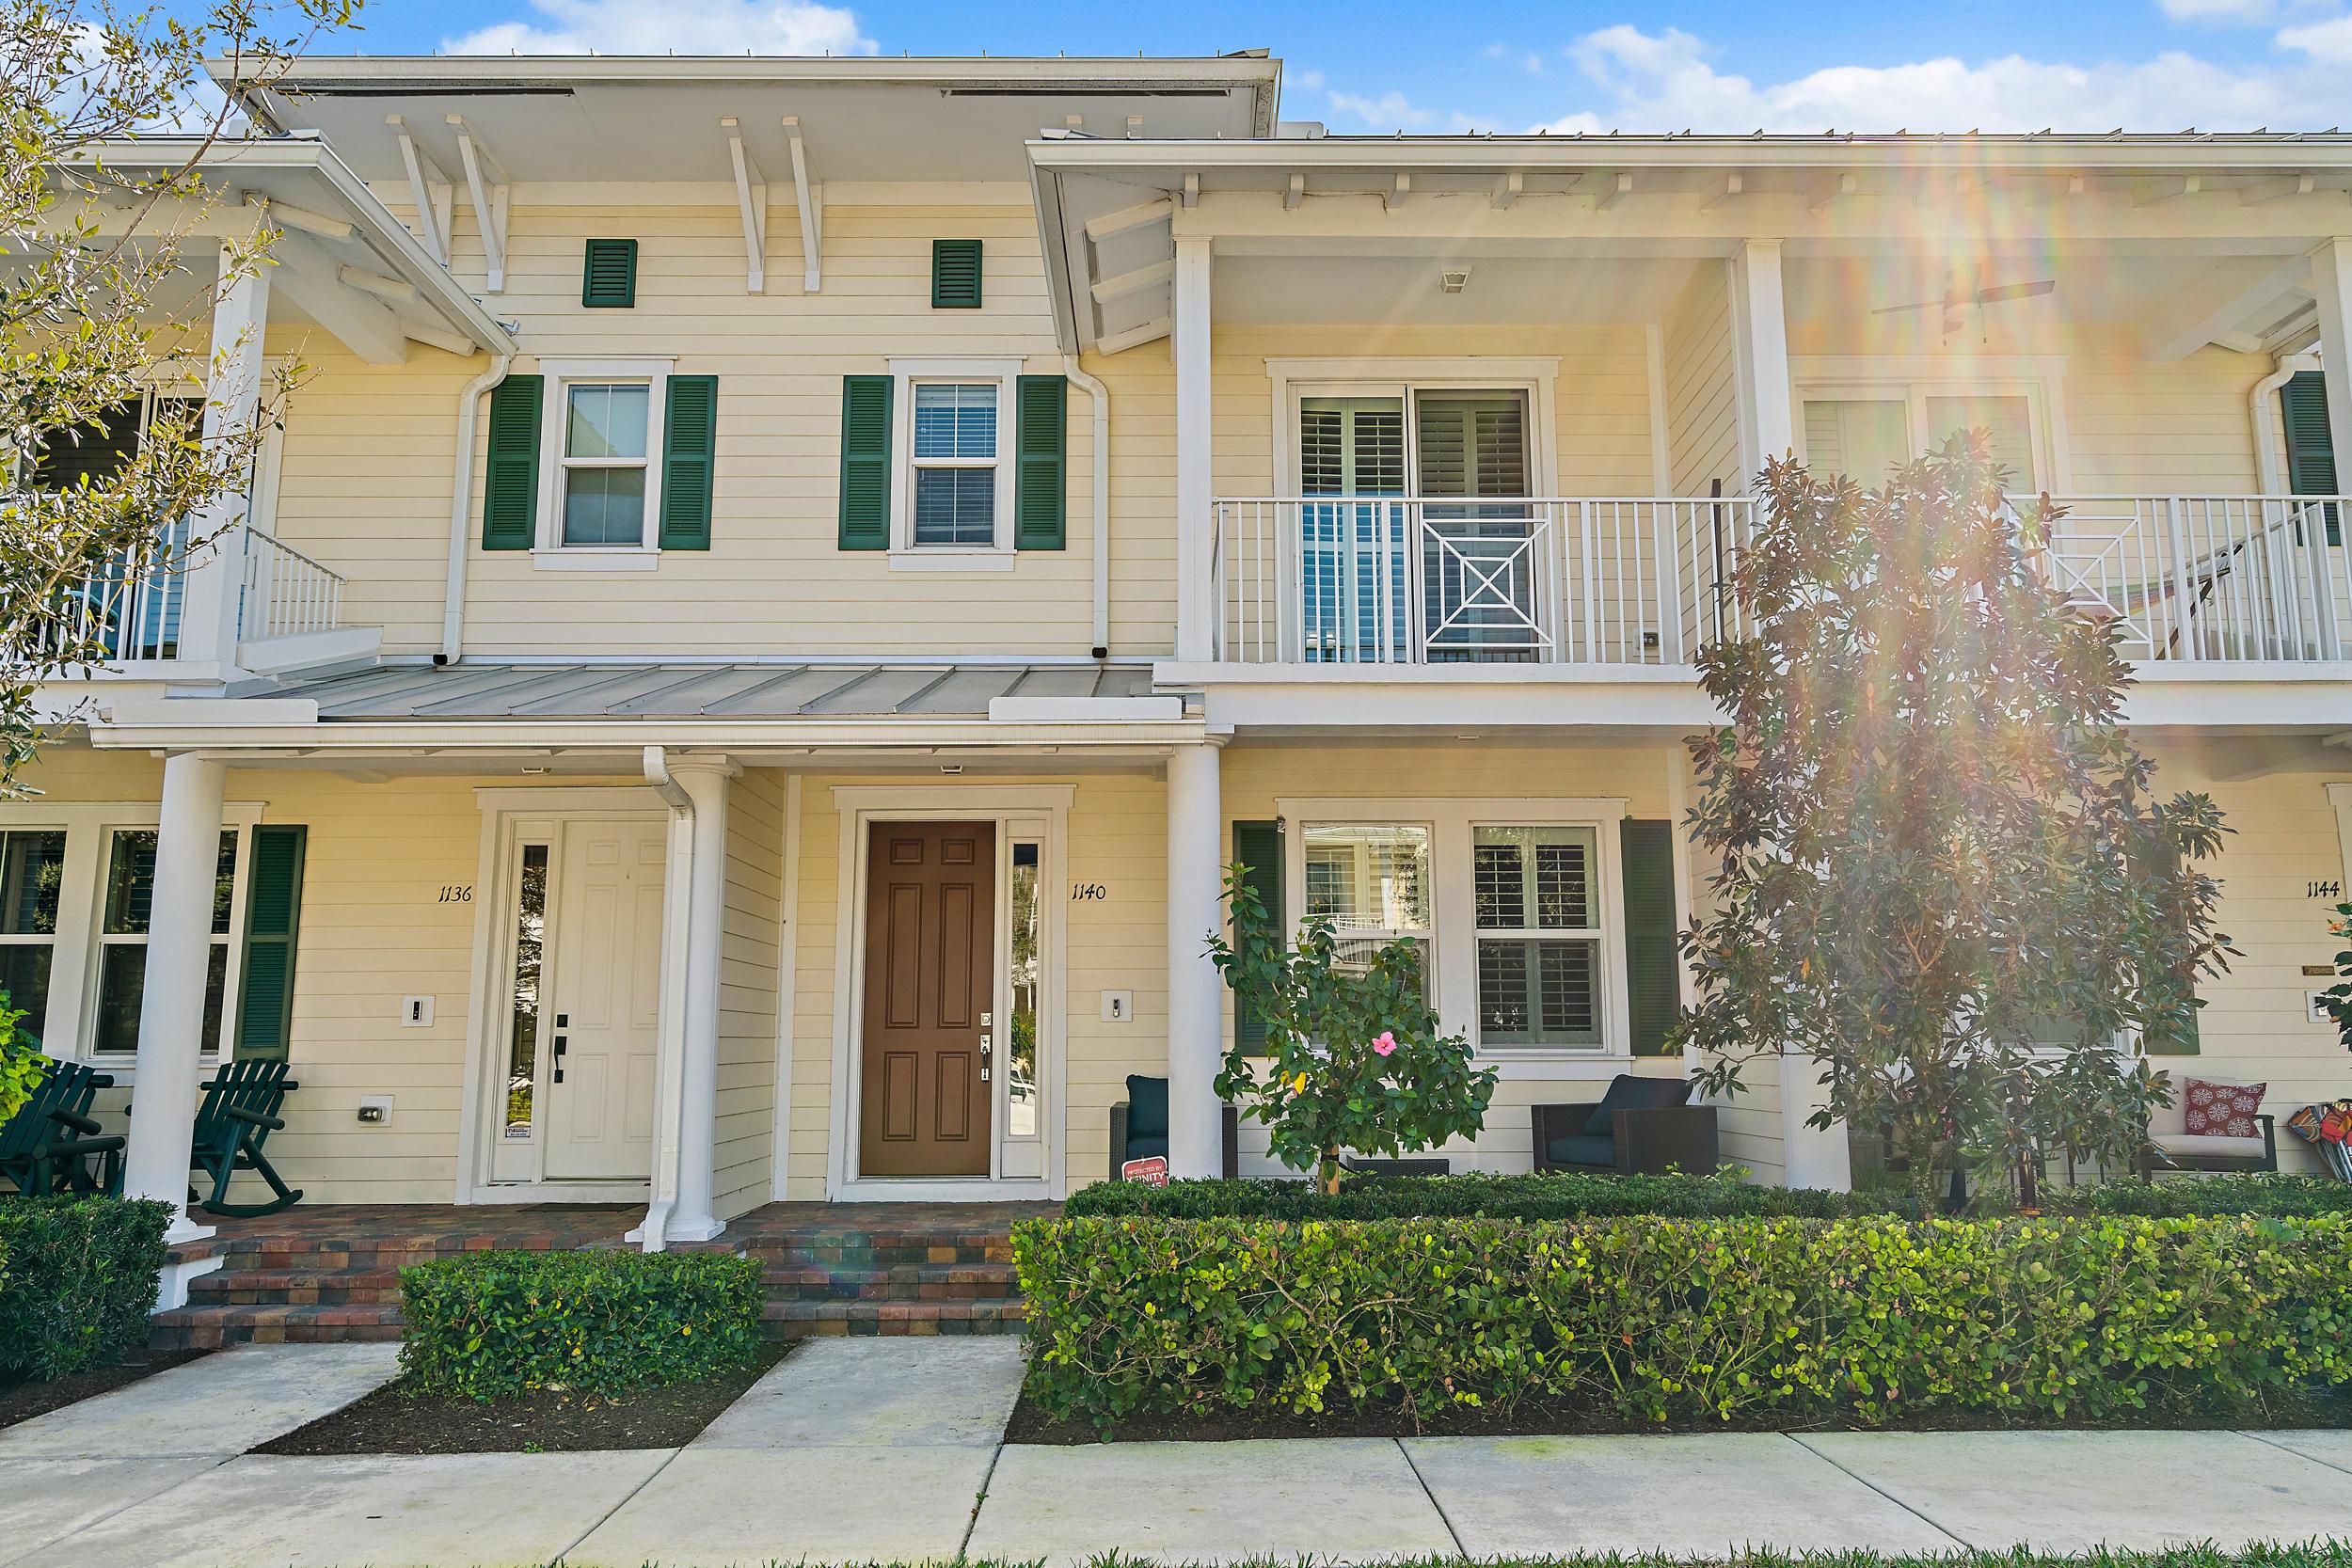 1140 Community Drive, Jupiter, Florida 33458, 3 Bedrooms Bedrooms, ,2.1 BathroomsBathrooms,F,Townhouse,Community,RX-10689374